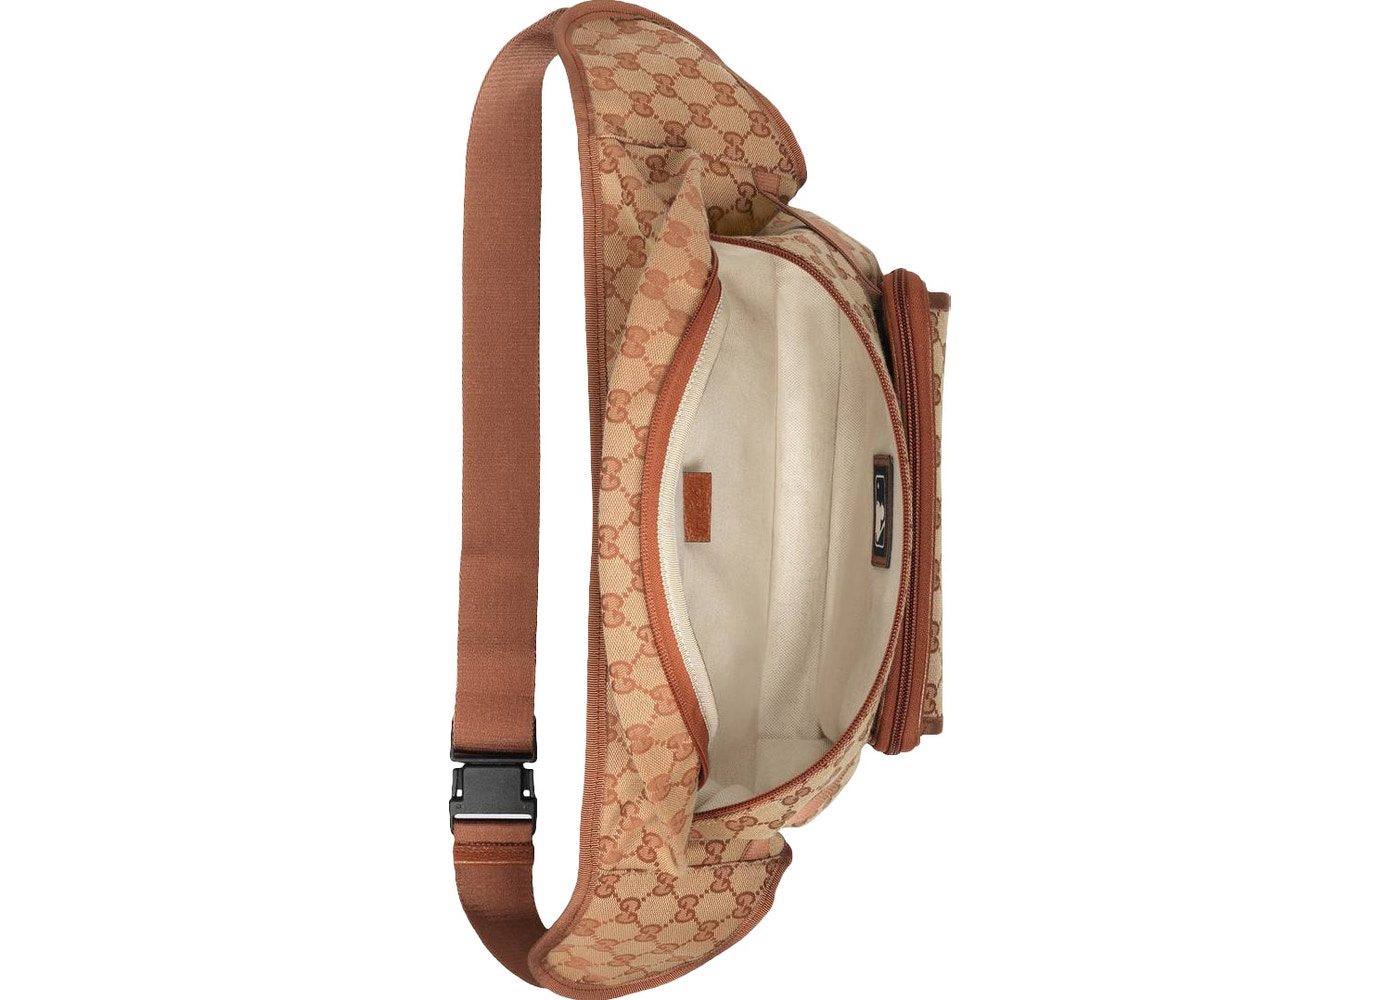 2b90126b431 Gucci Belt Bag LA Angels Patch Brick Red Beige